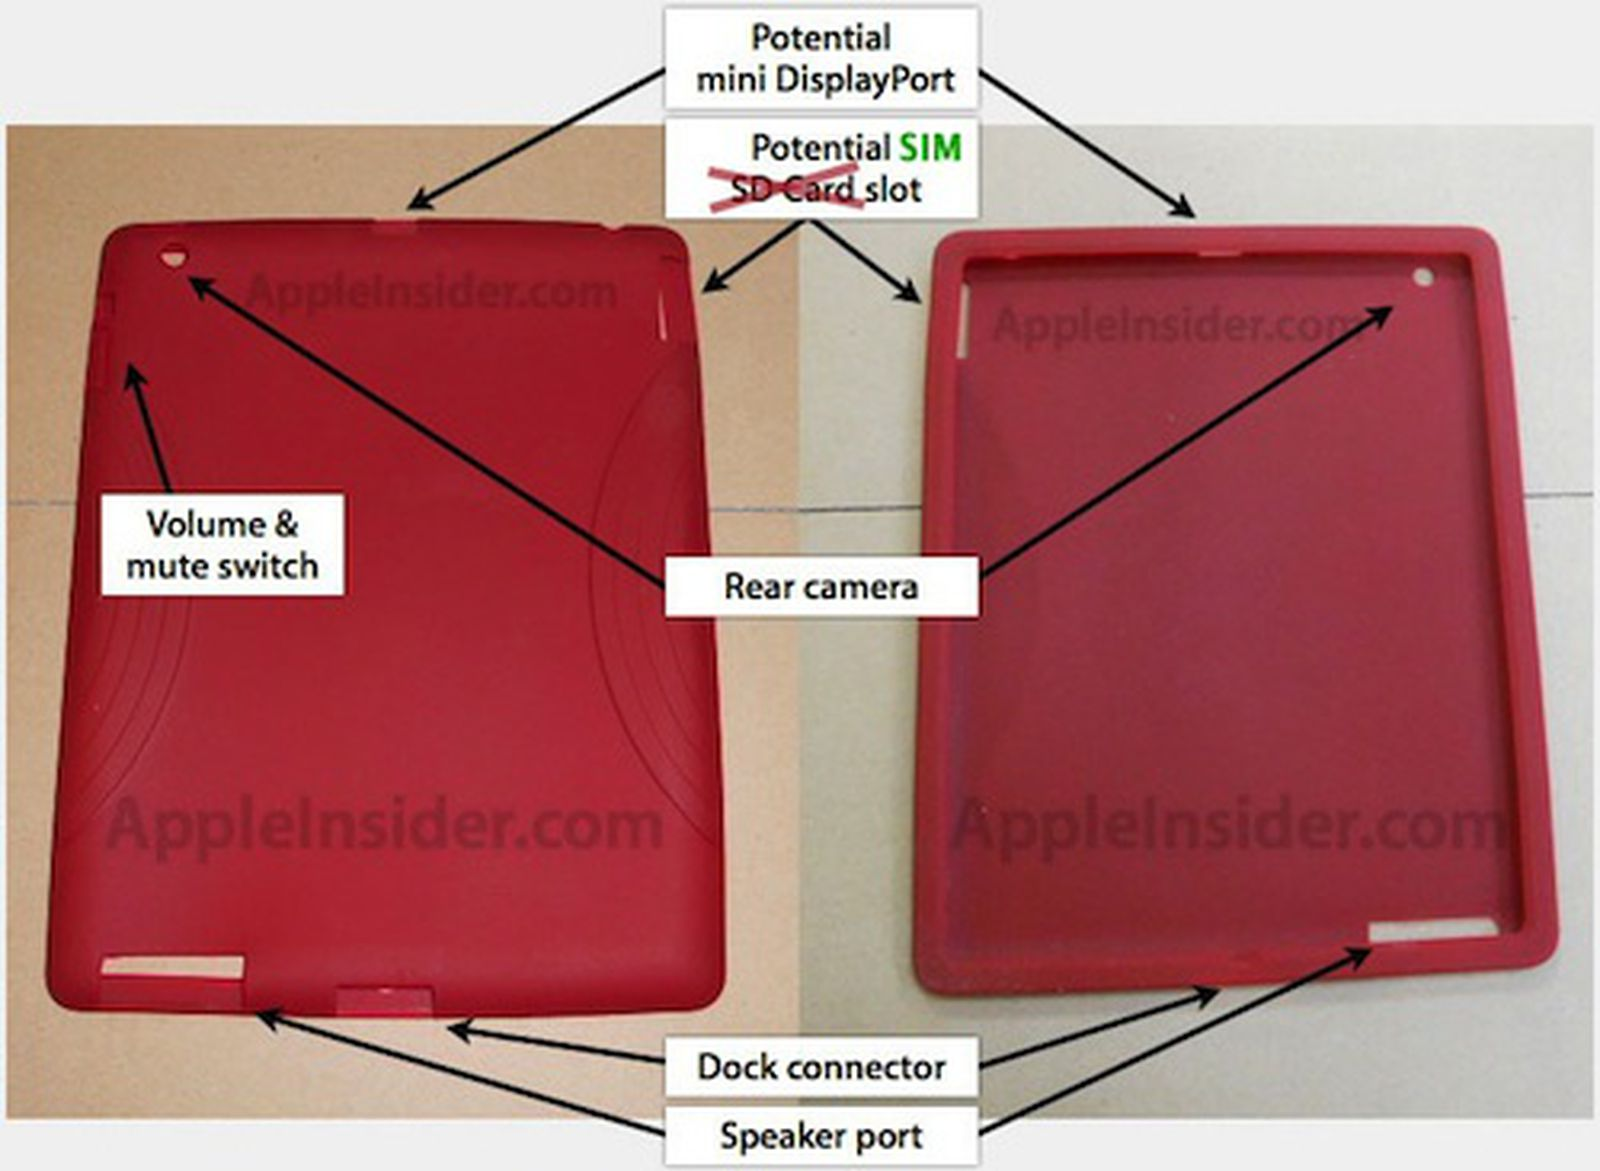 No SD Card Slot in Next-Generation iPad? - MacRumors